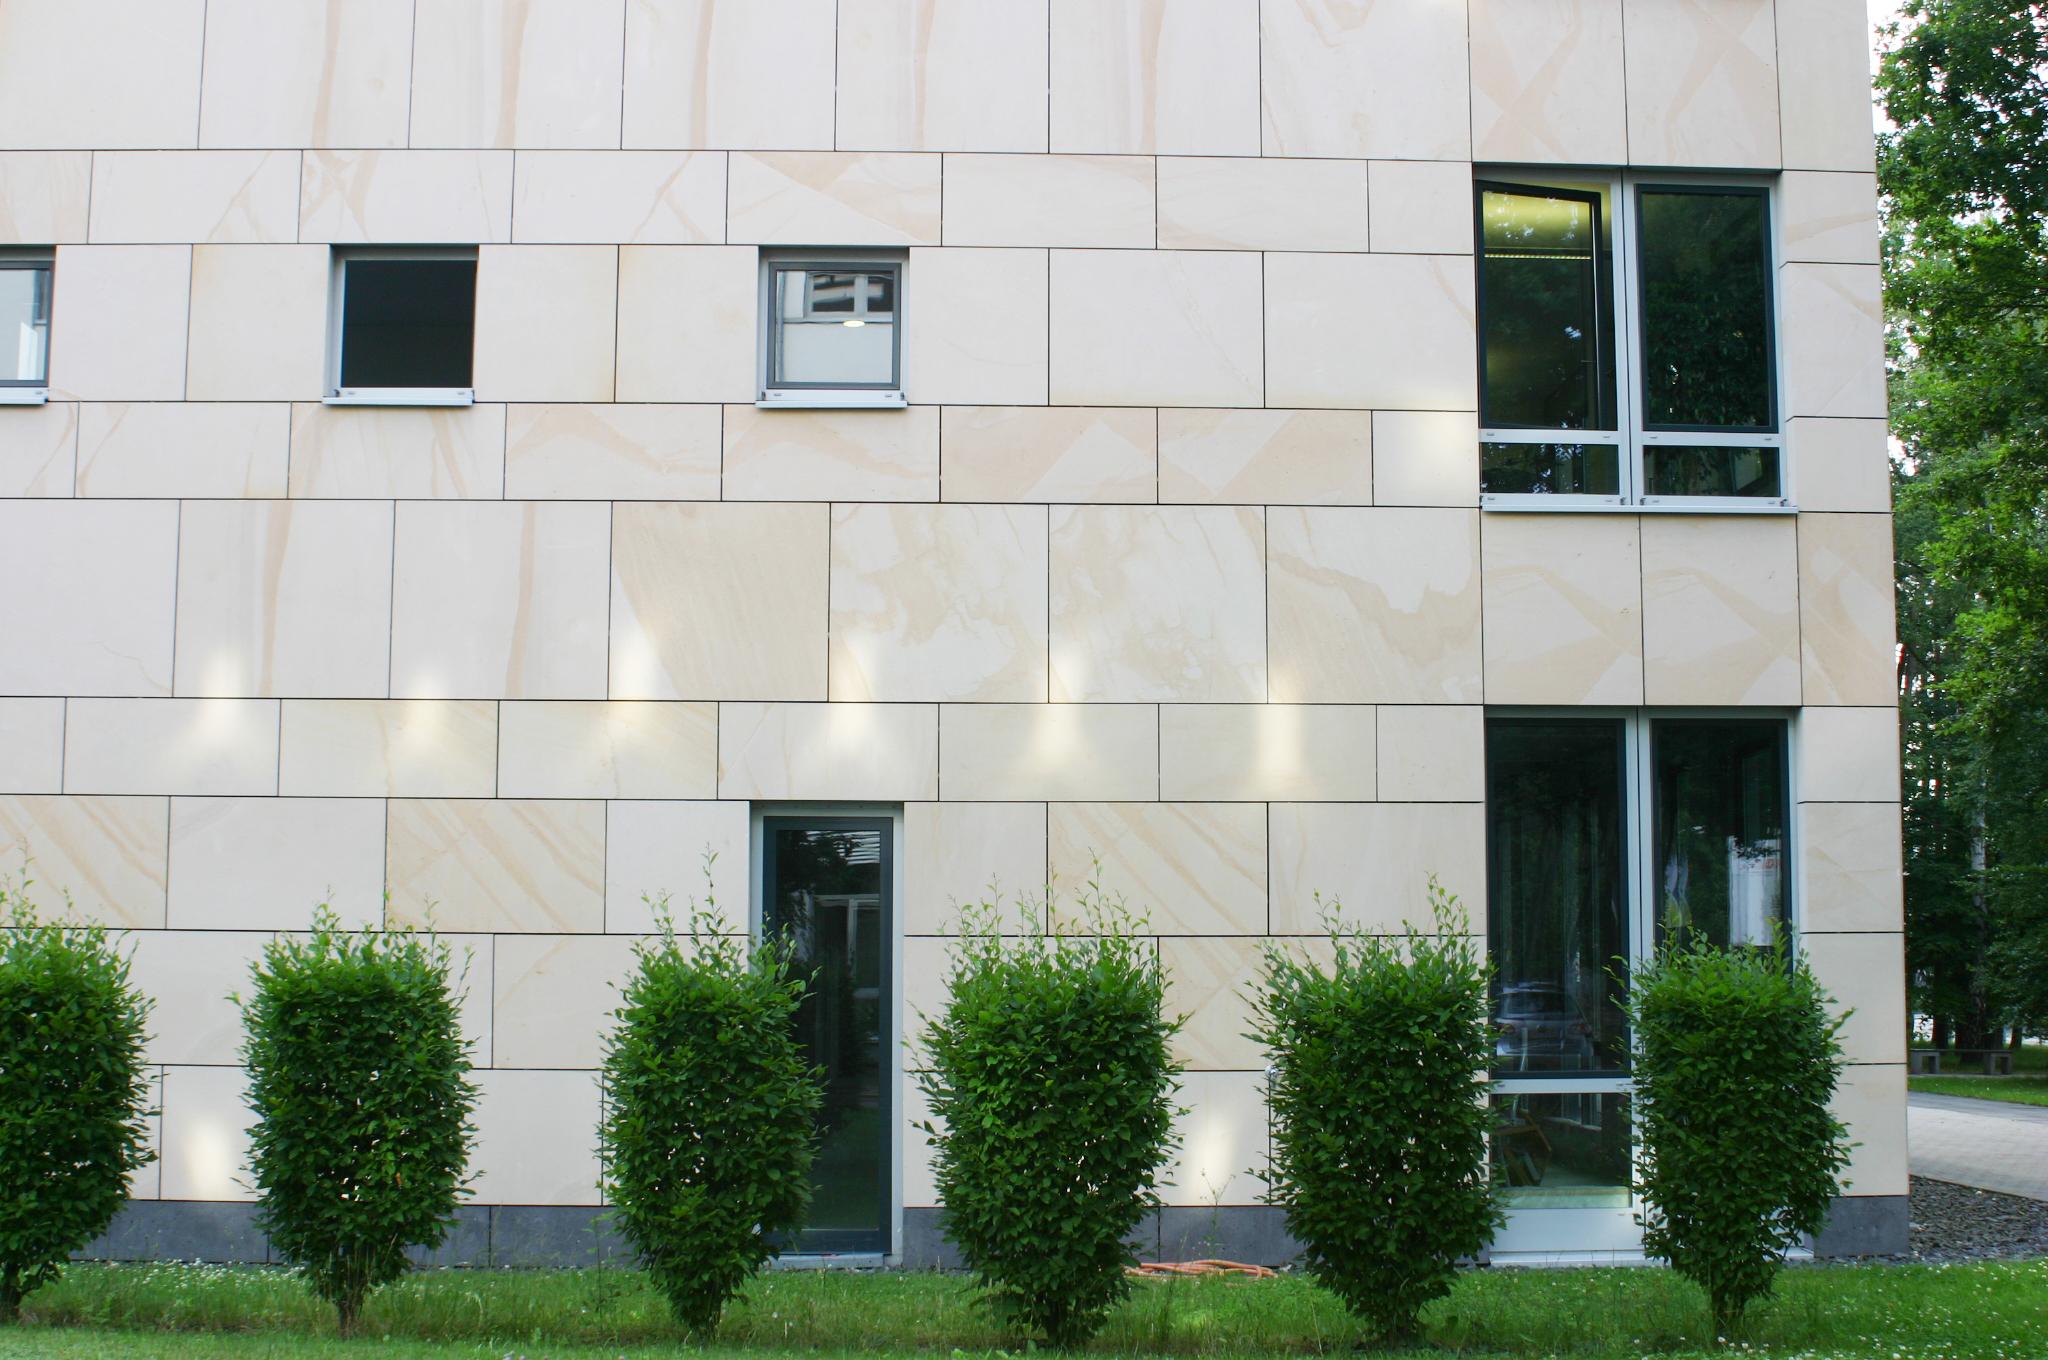 Sandsteinfassade Nebeneingang Hugenottenallee Neu-Isenburg